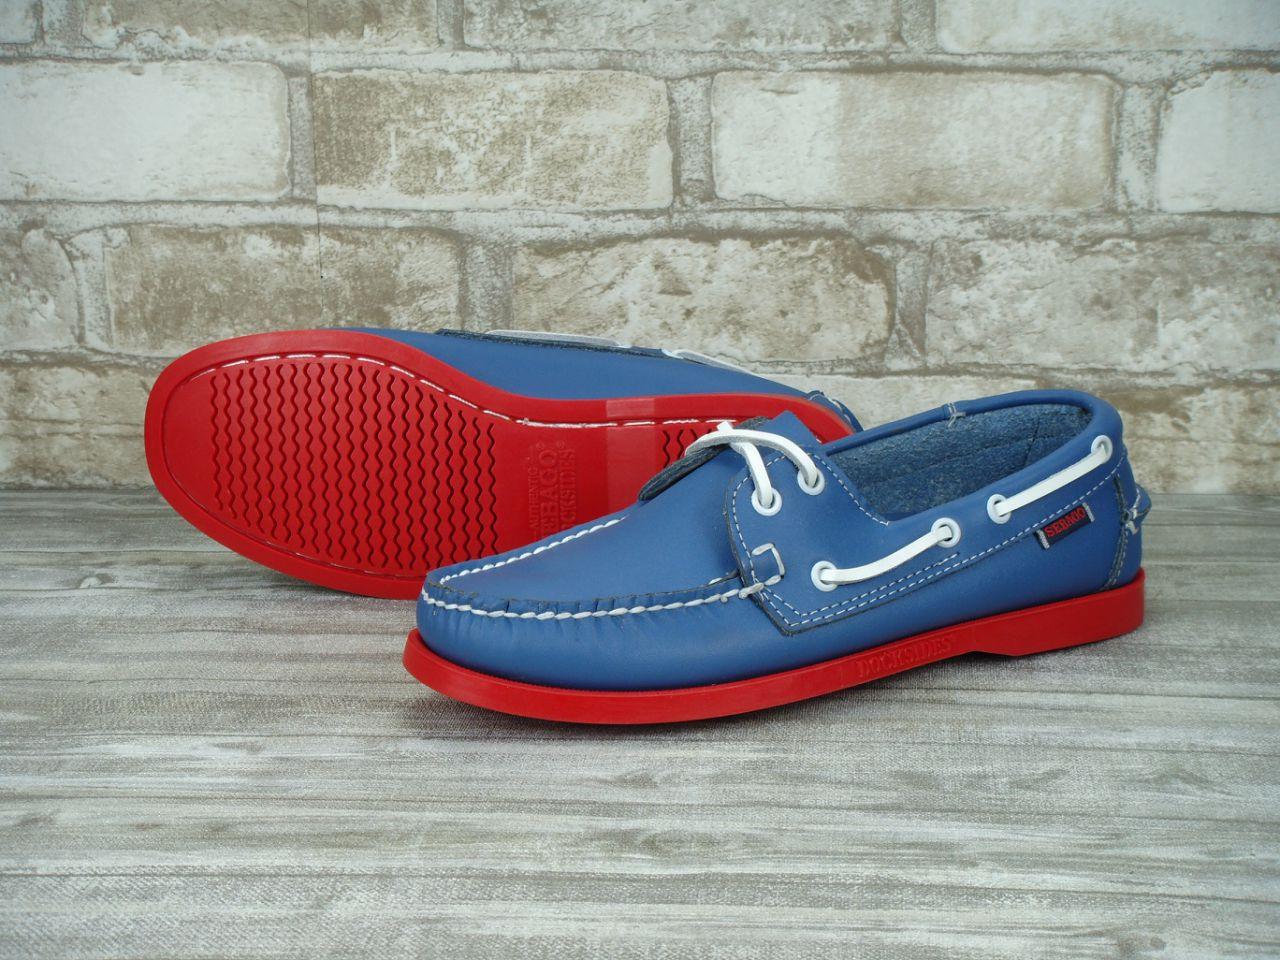 Мокасины топсайдеры Sebago Docksides кожаные blue/red (Реплика ААА+)